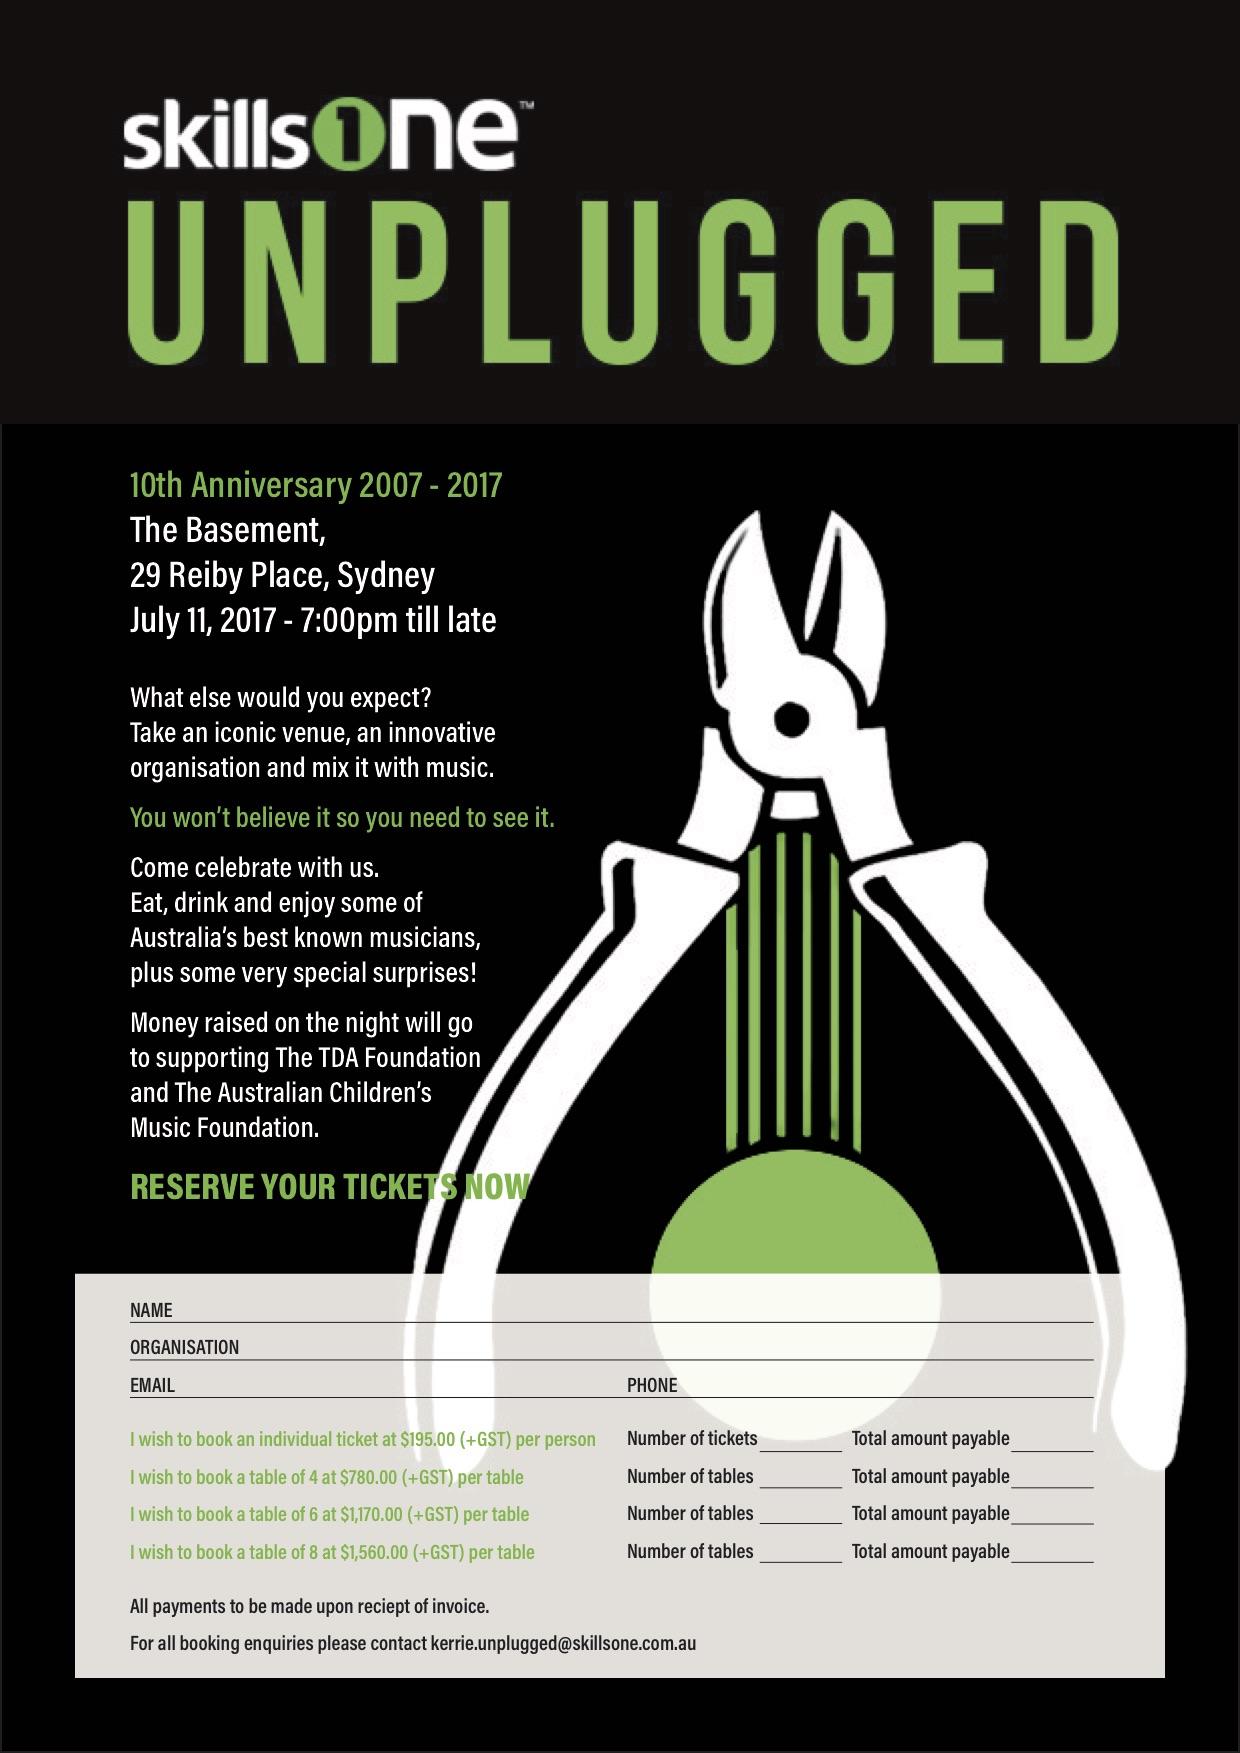 Skillsone Unplugged